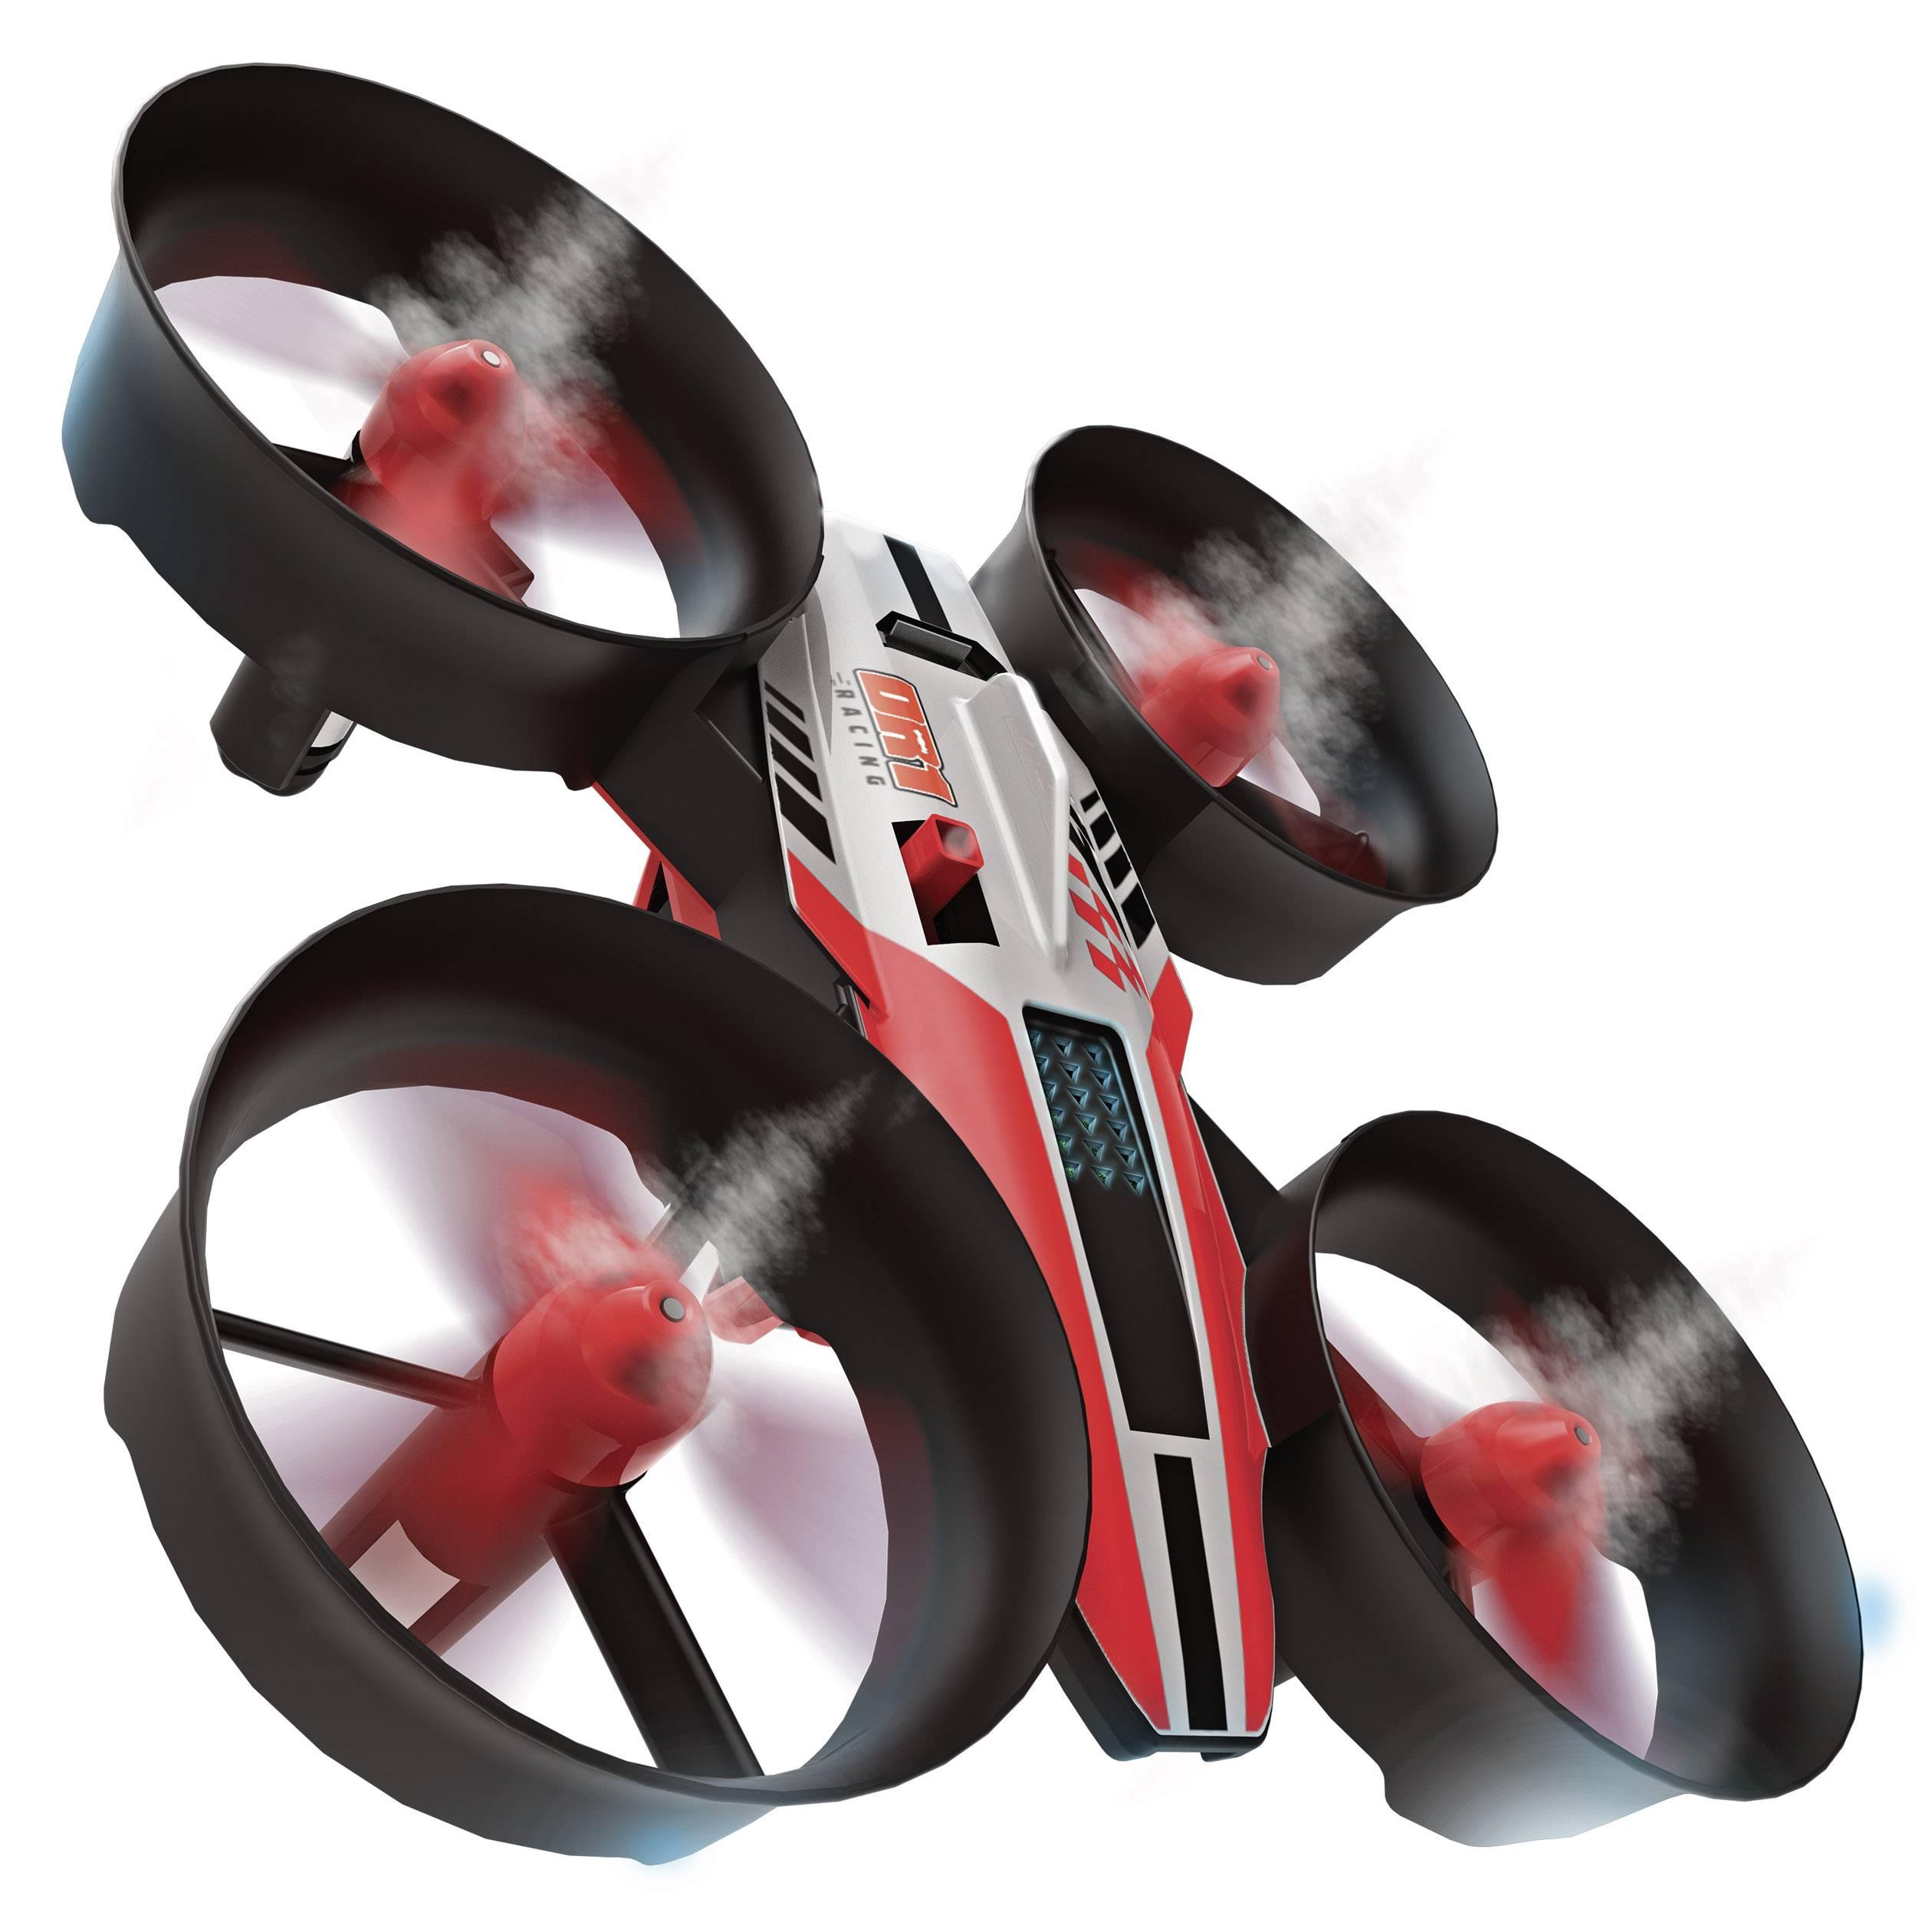 Závodní dron Air Hogs DR1 FPV, FPV Race